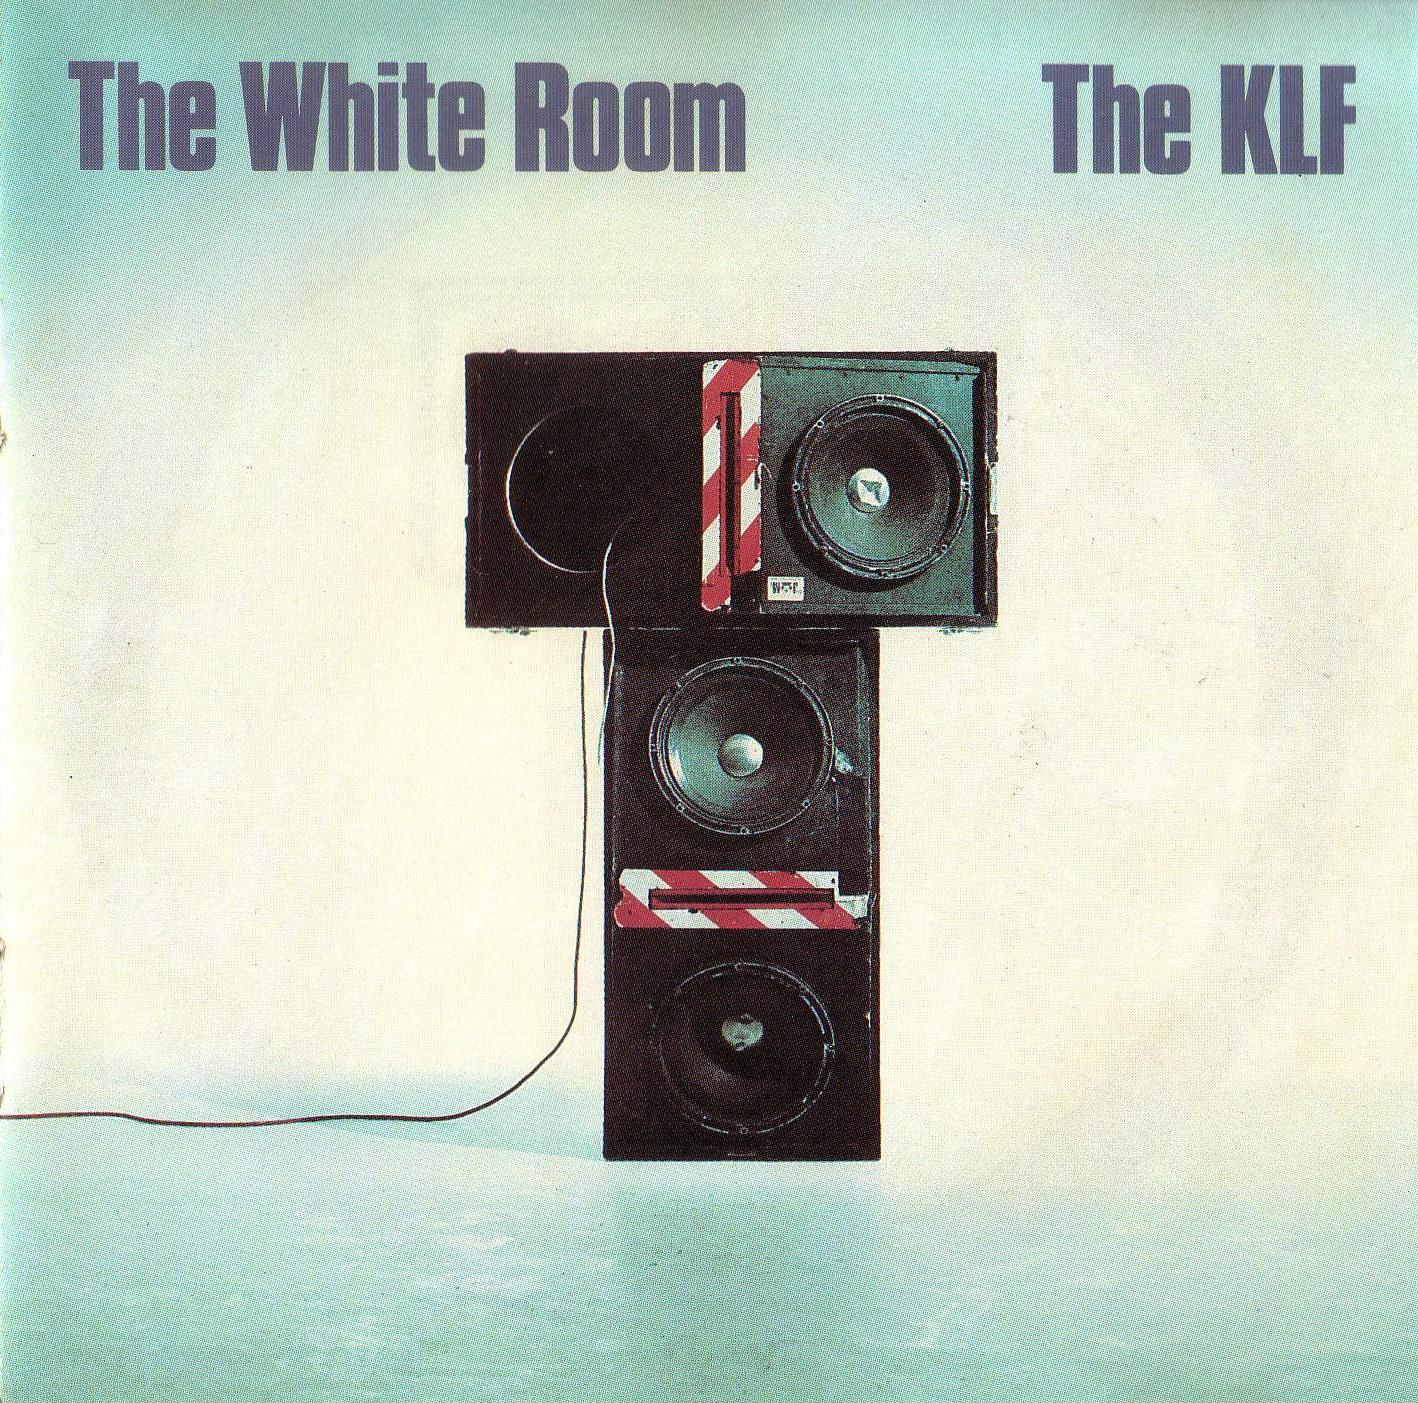 RETRO DISCO HINRG KLF  The White Room Album 1991